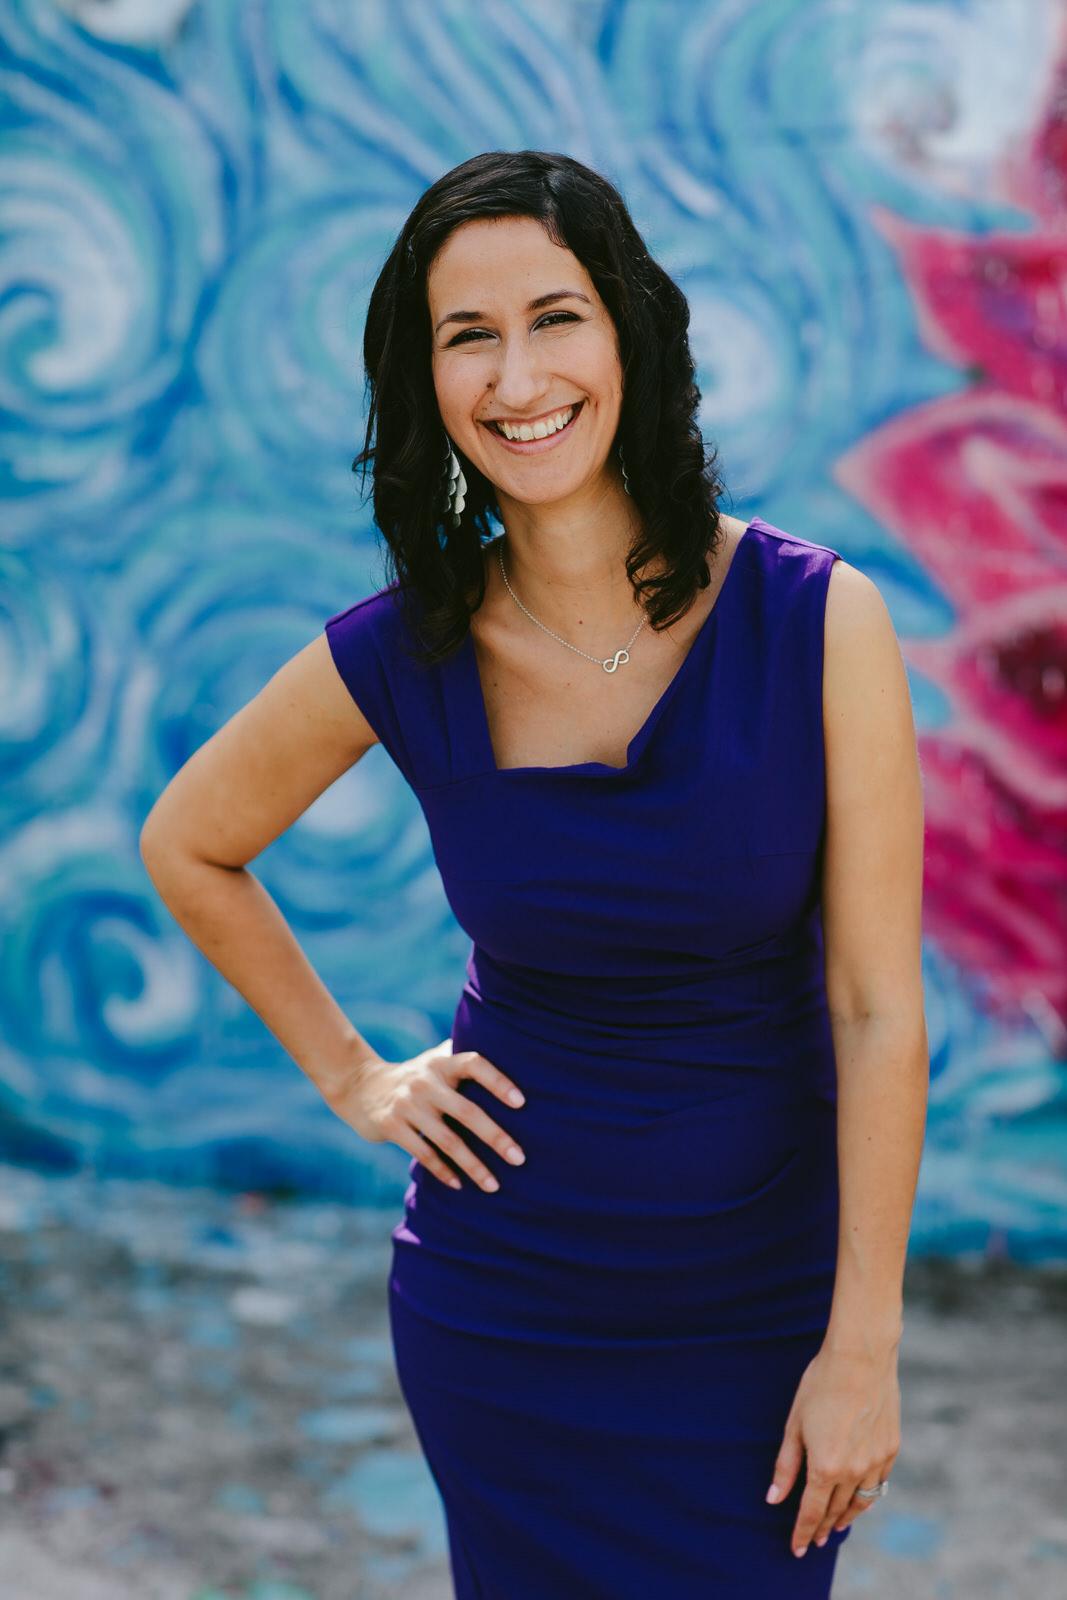 Purplewing_Branding_Portraits_Fort_Lauderdale_Tiny_House_Photo_Outdoor_Graffiti_Headshots-7.jpg